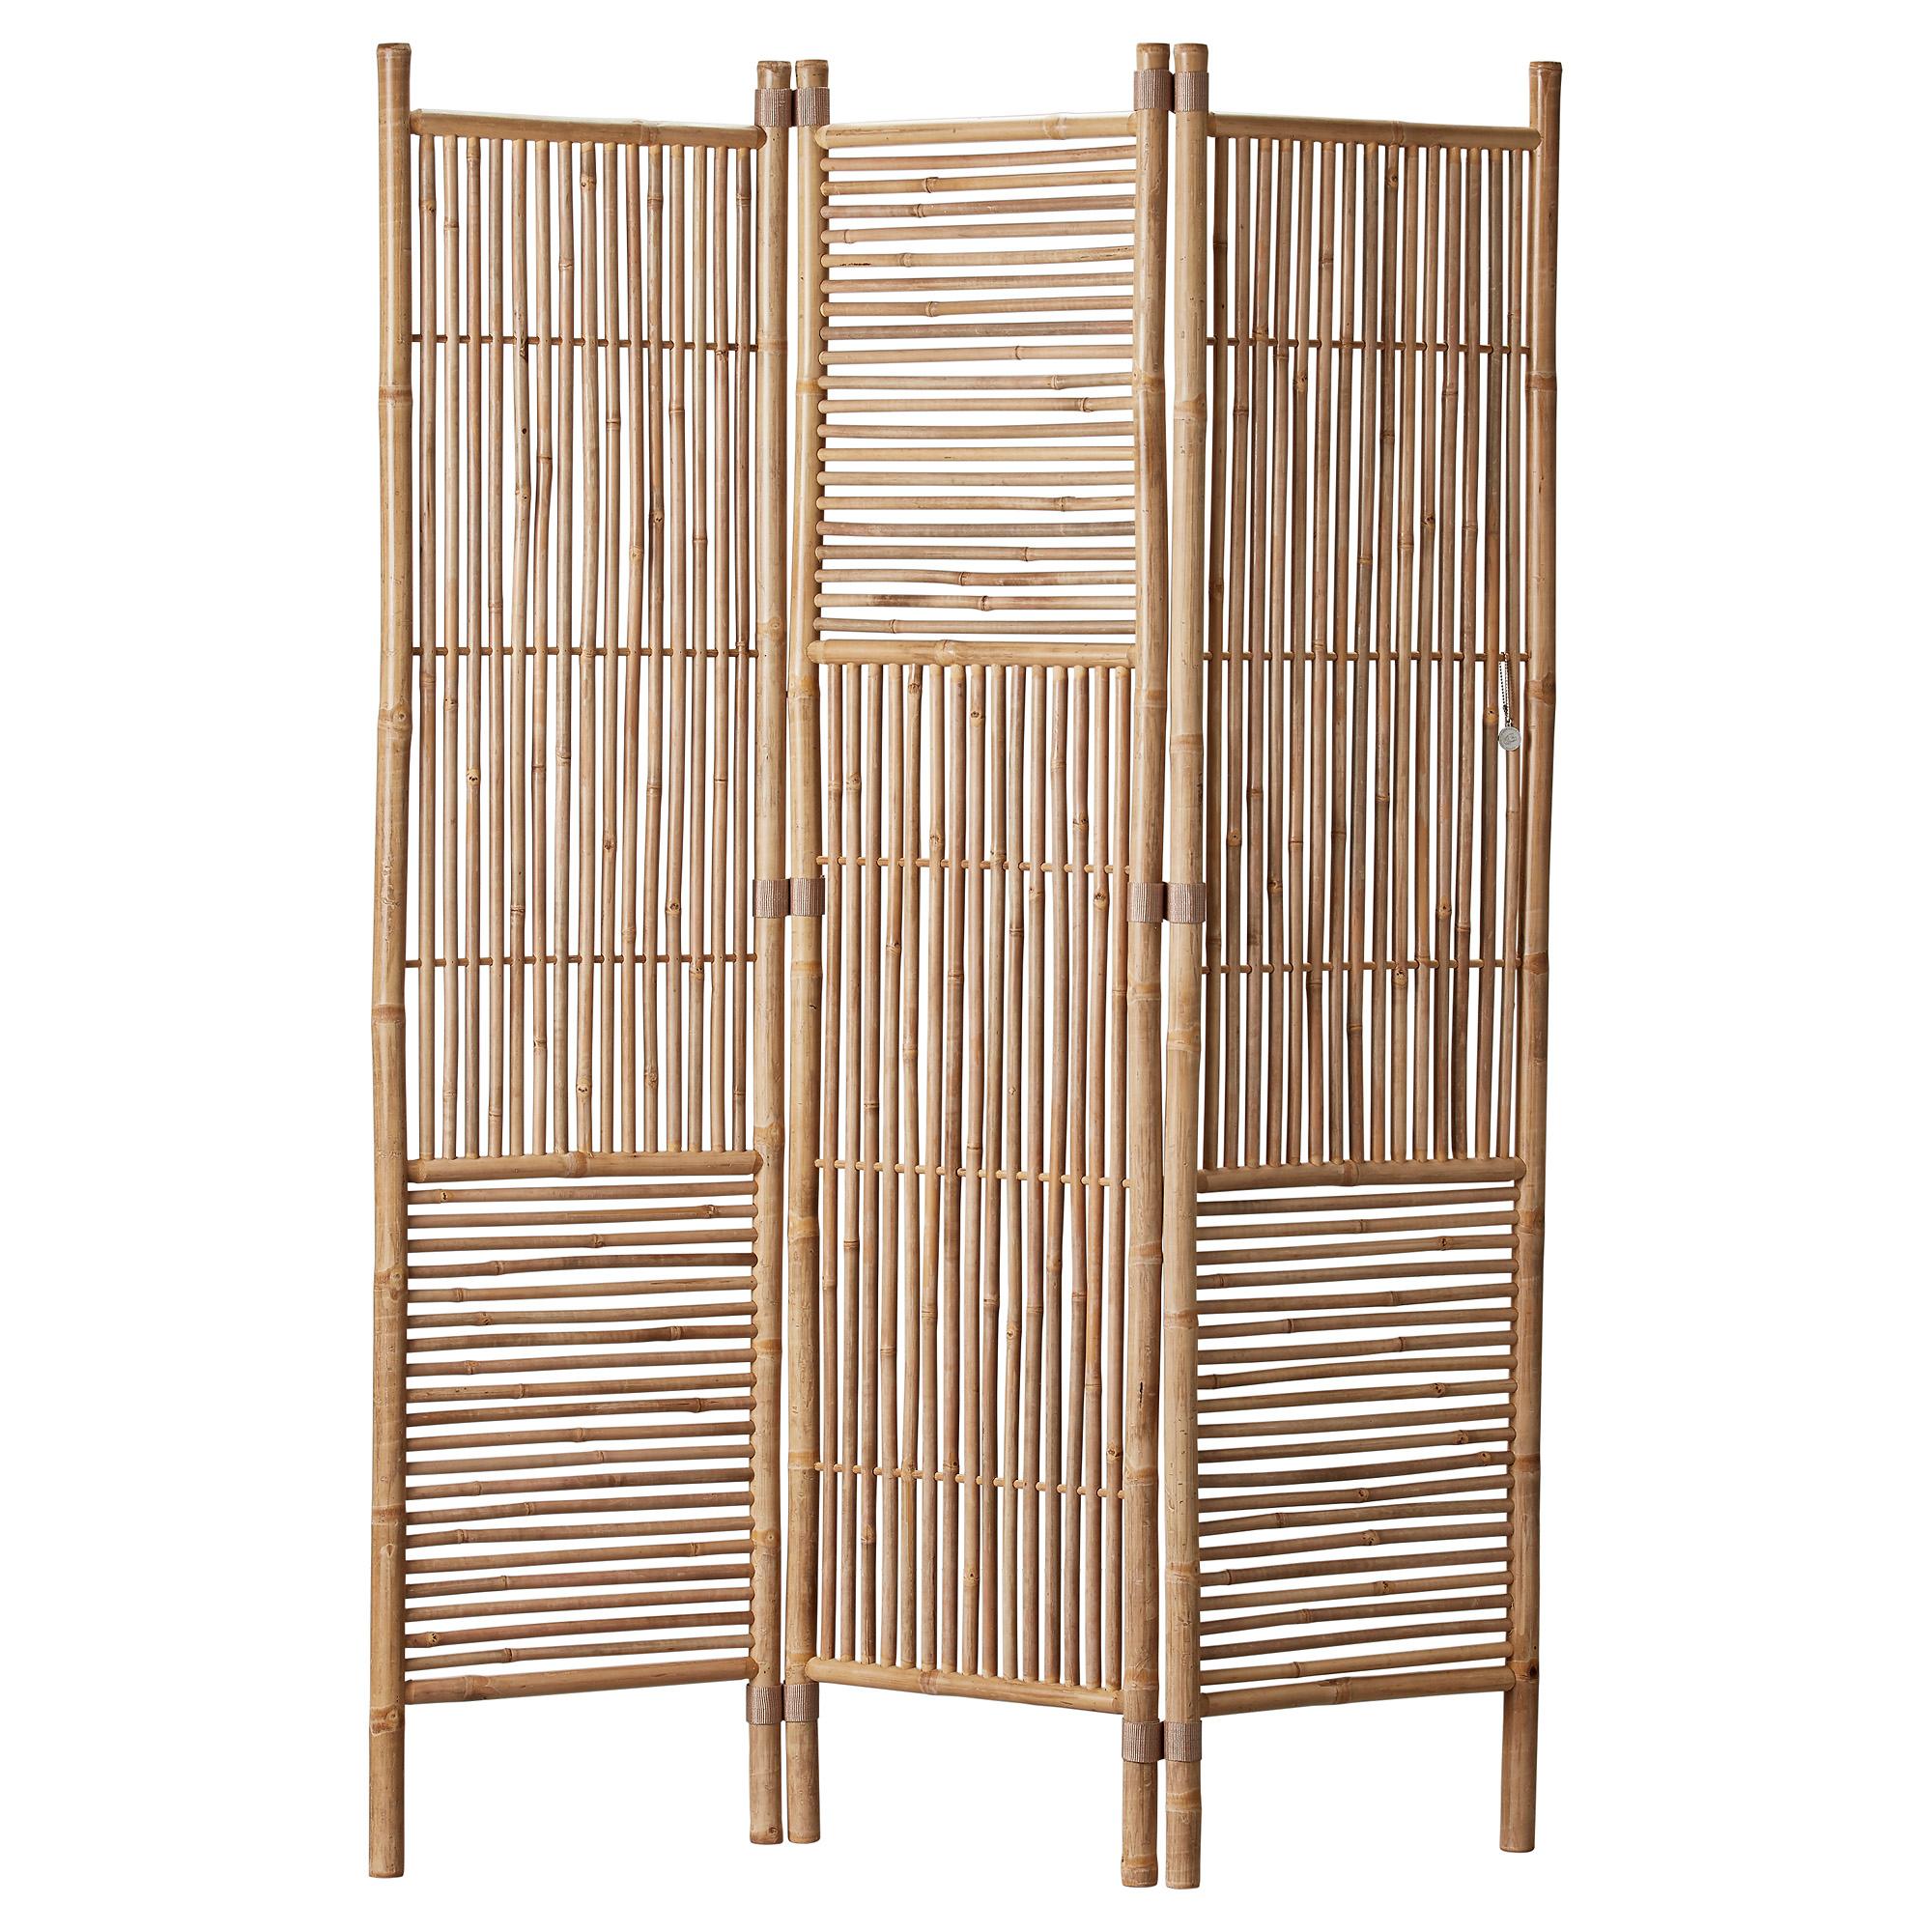 lene bjerre mandisa sermi luonnonv ri koti sisustus. Black Bedroom Furniture Sets. Home Design Ideas